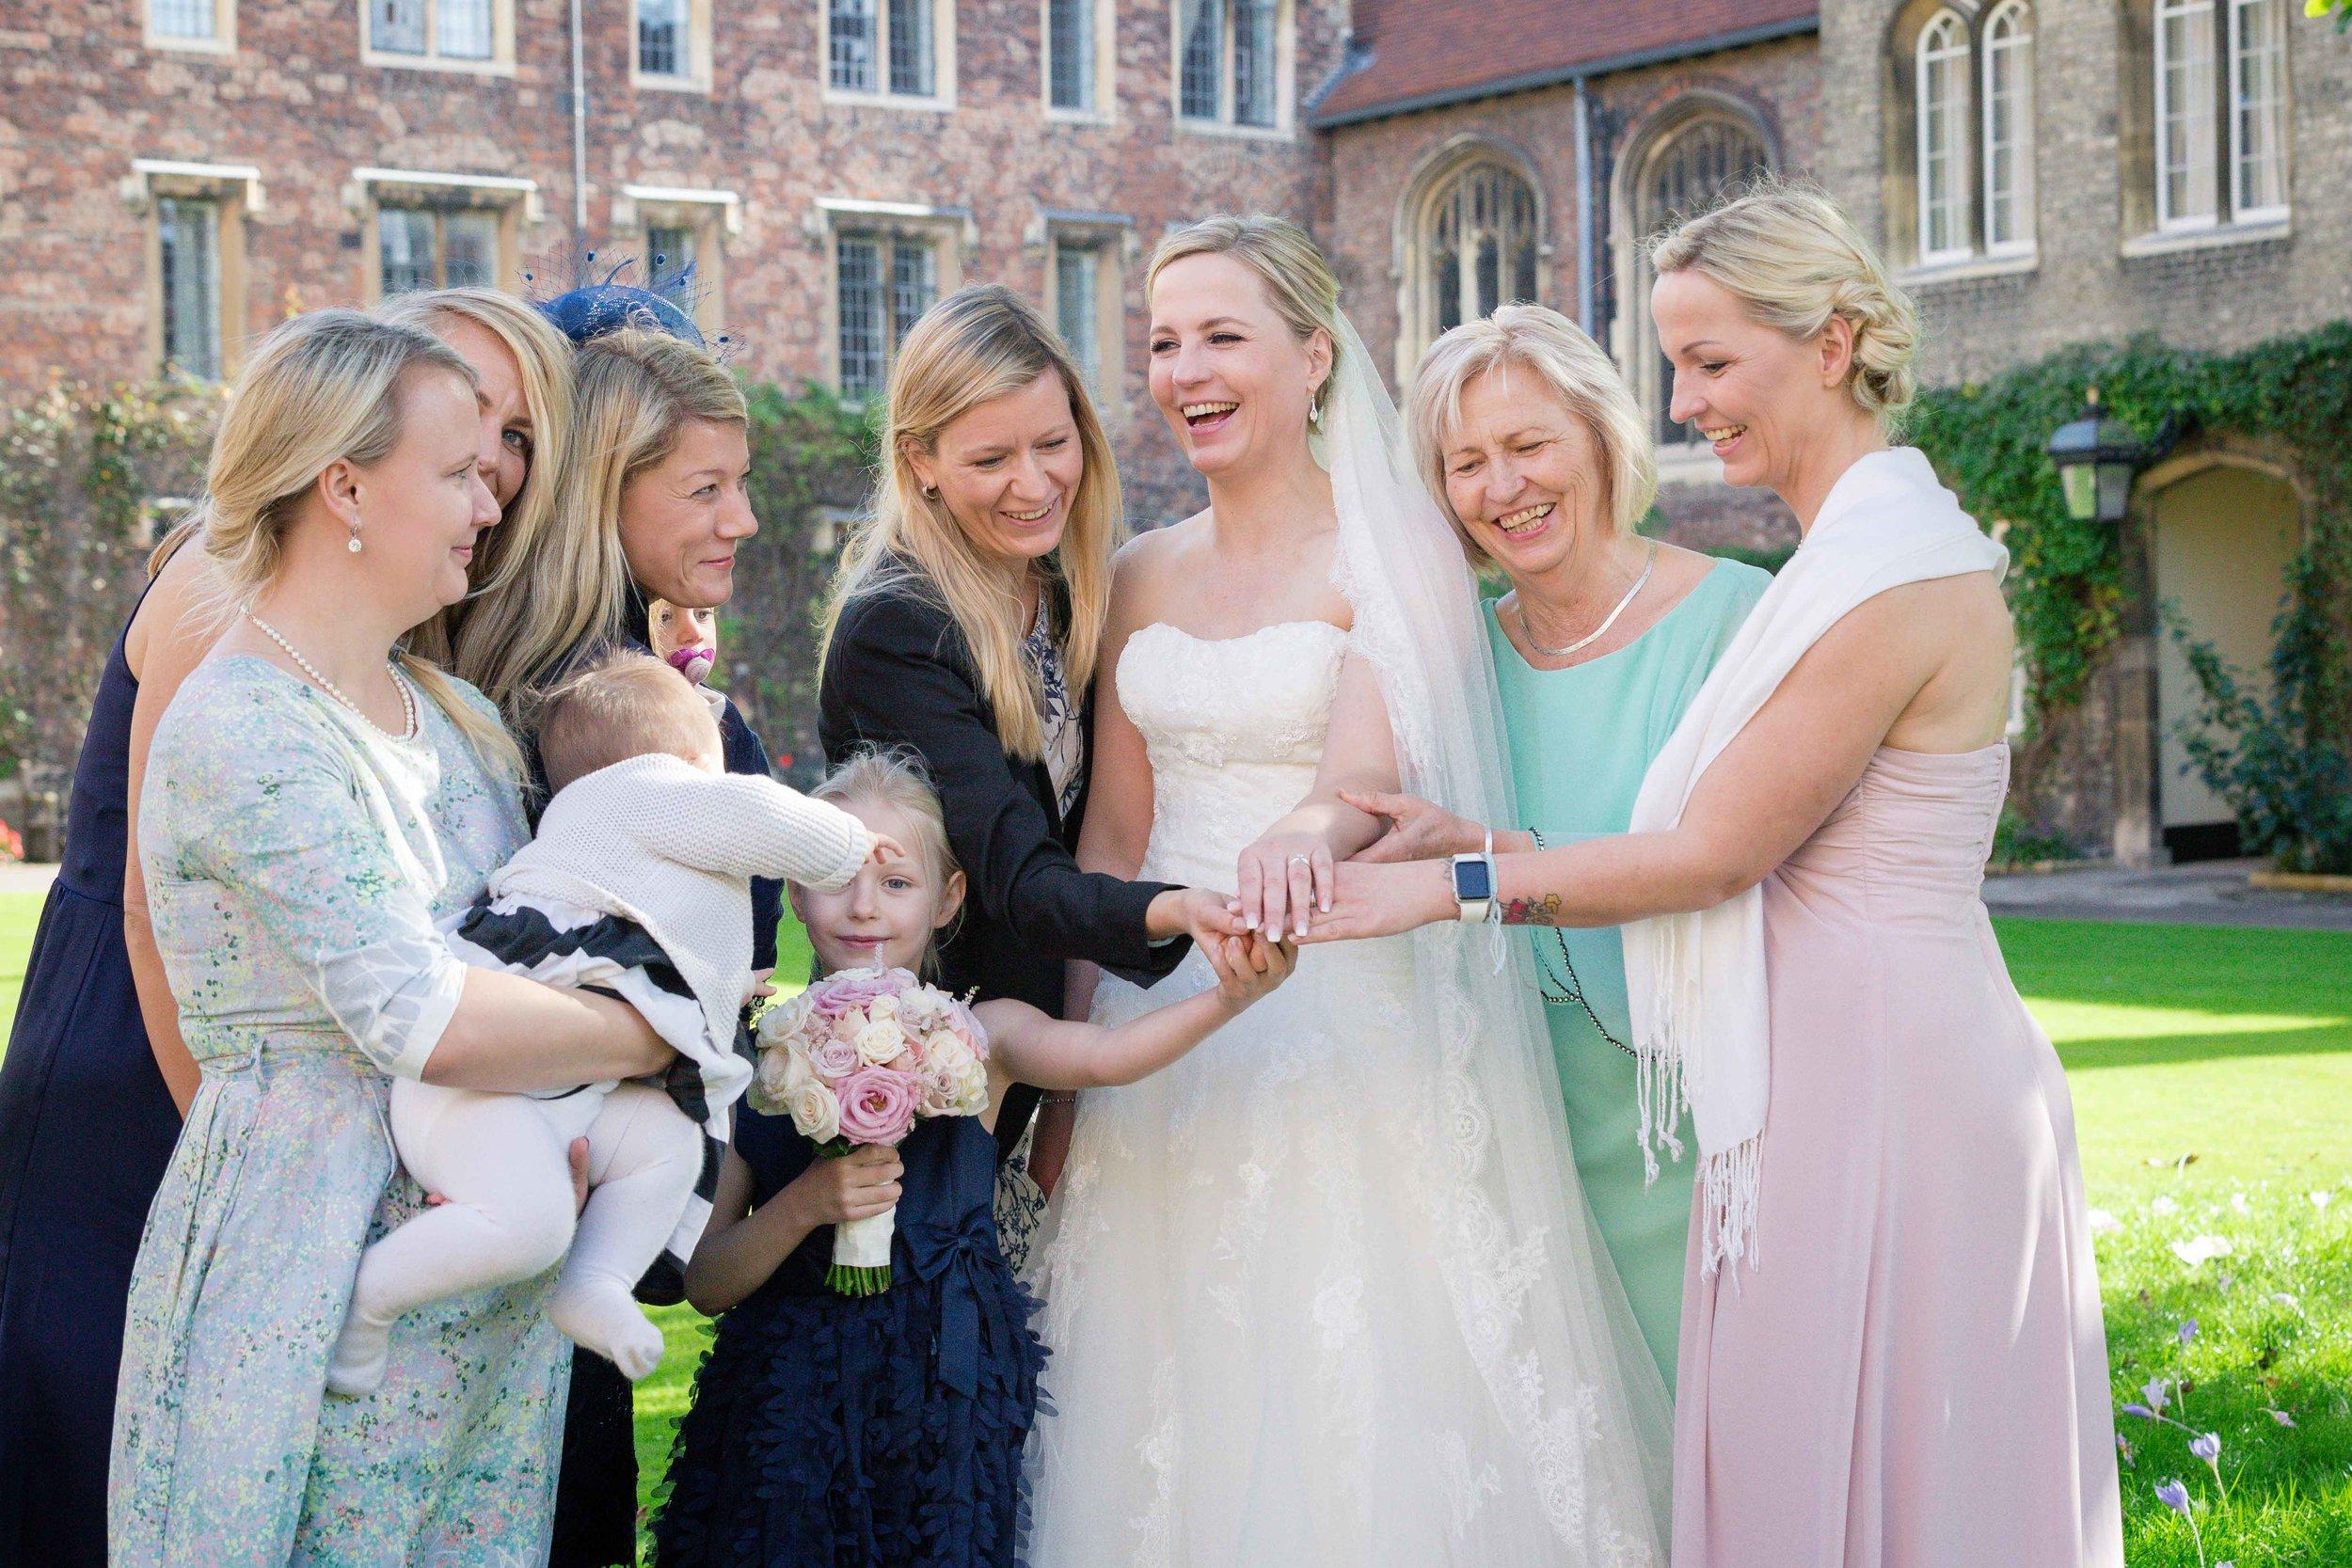 Adrian_Nicole_Charnwood_Weddings_Queens_College_Cambridge-1044.jpg